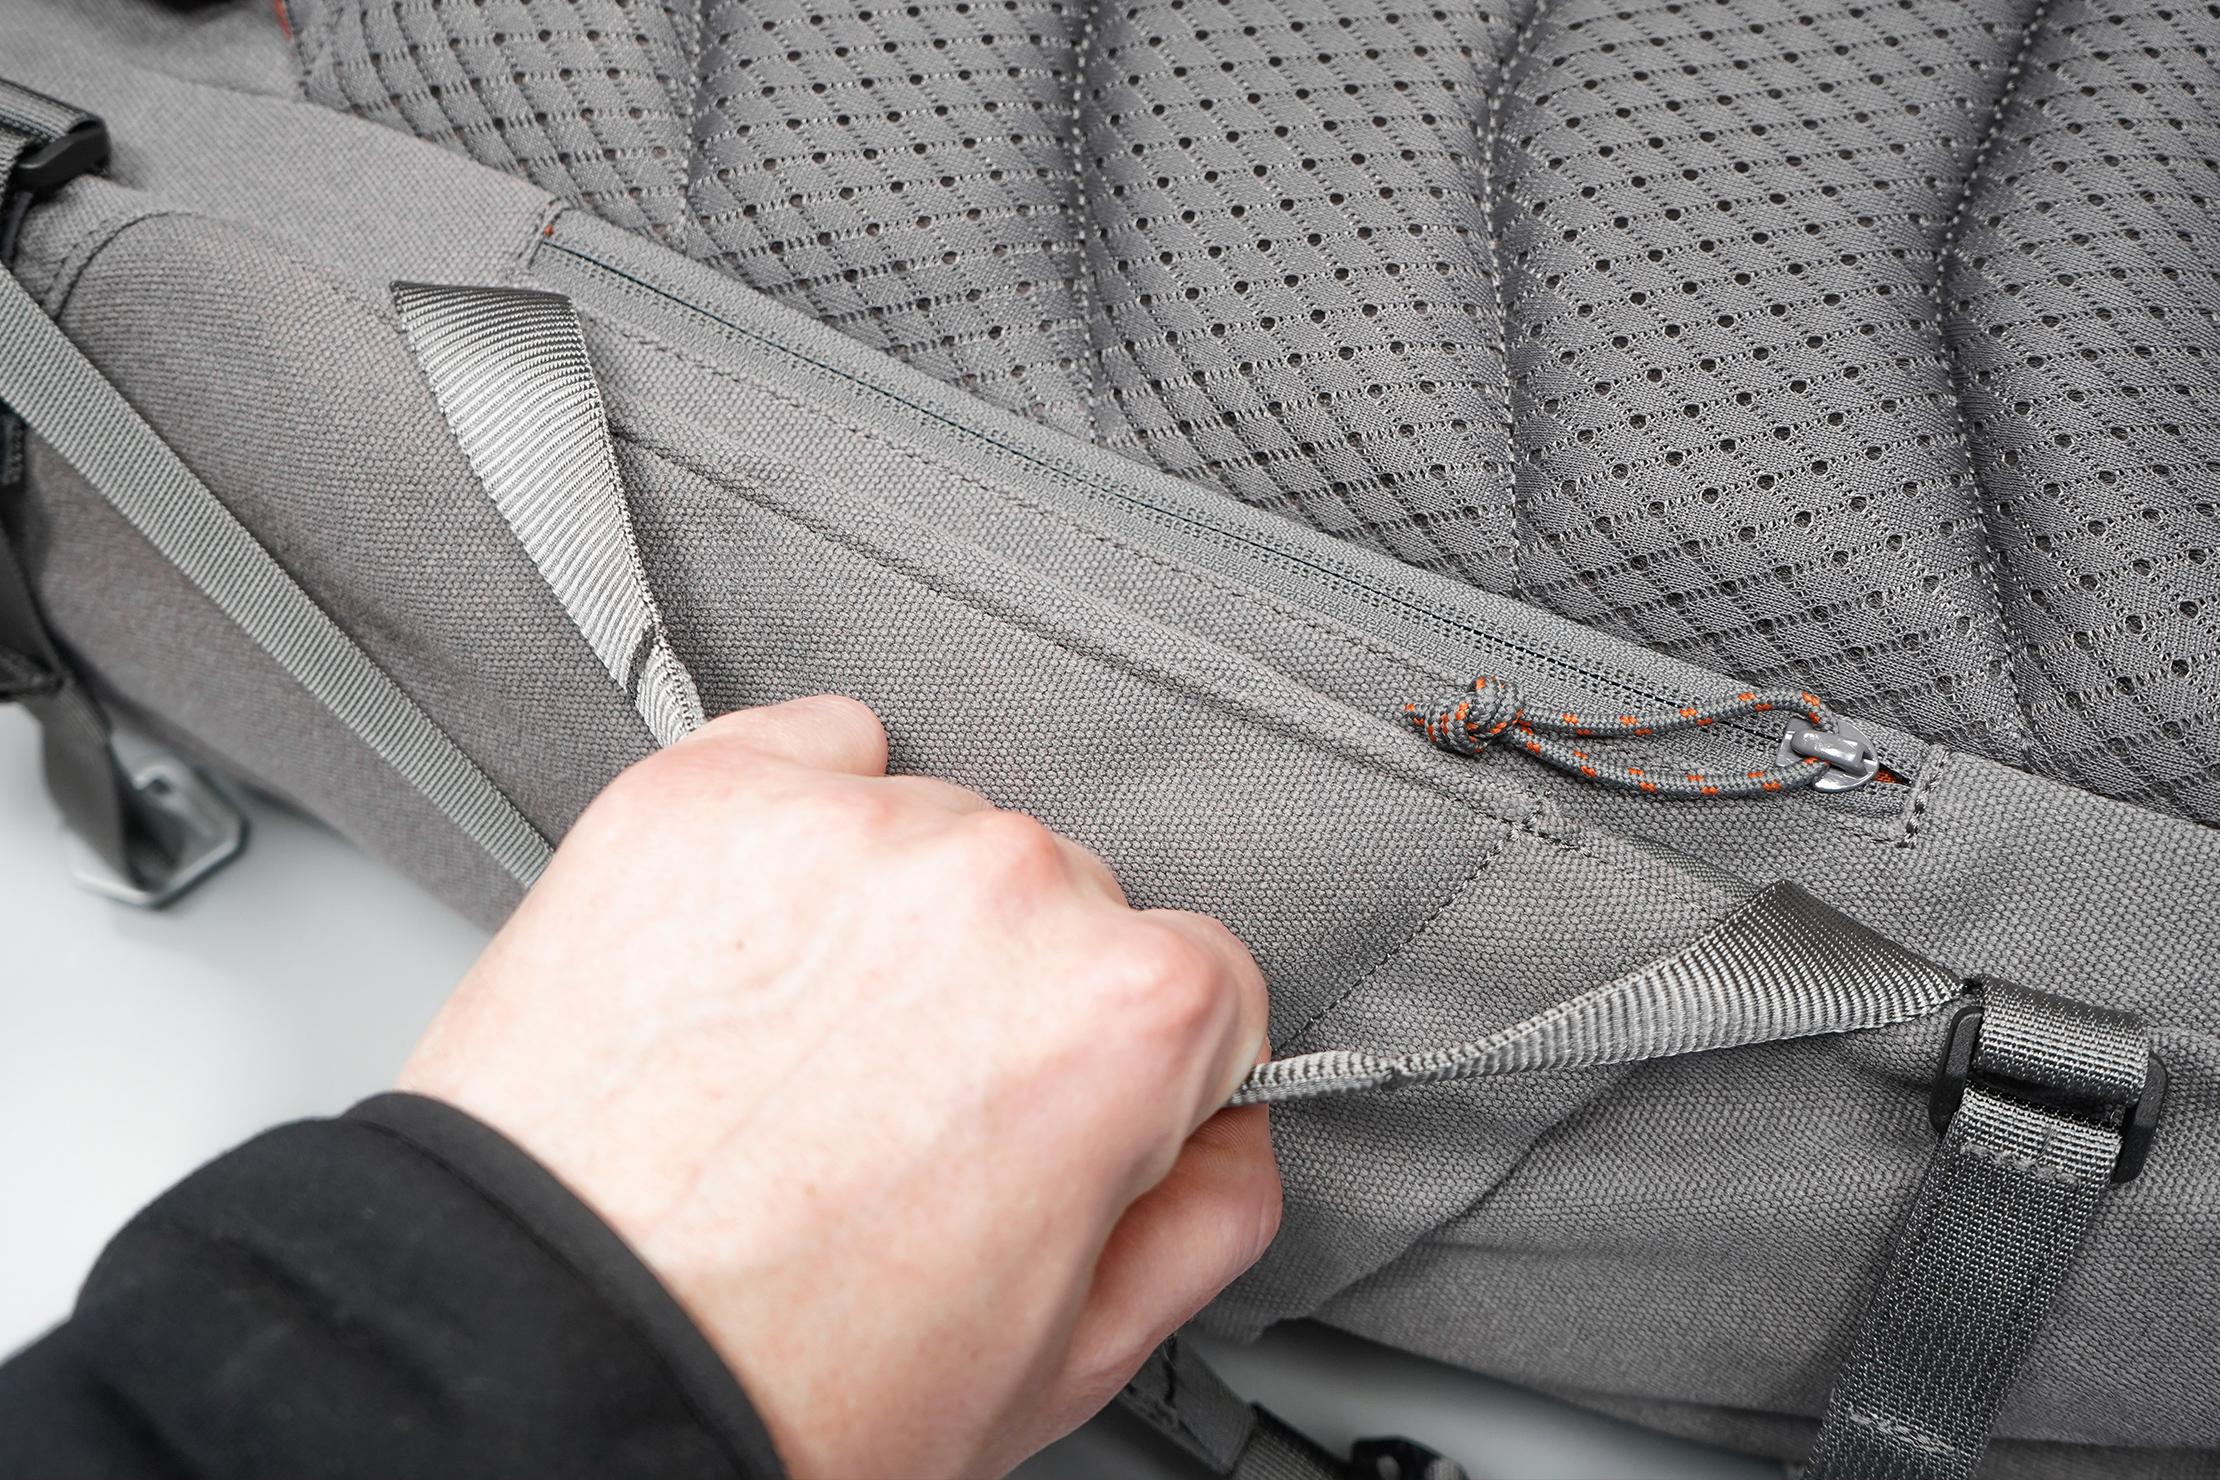 Salkan Backpacker | Using the side handle